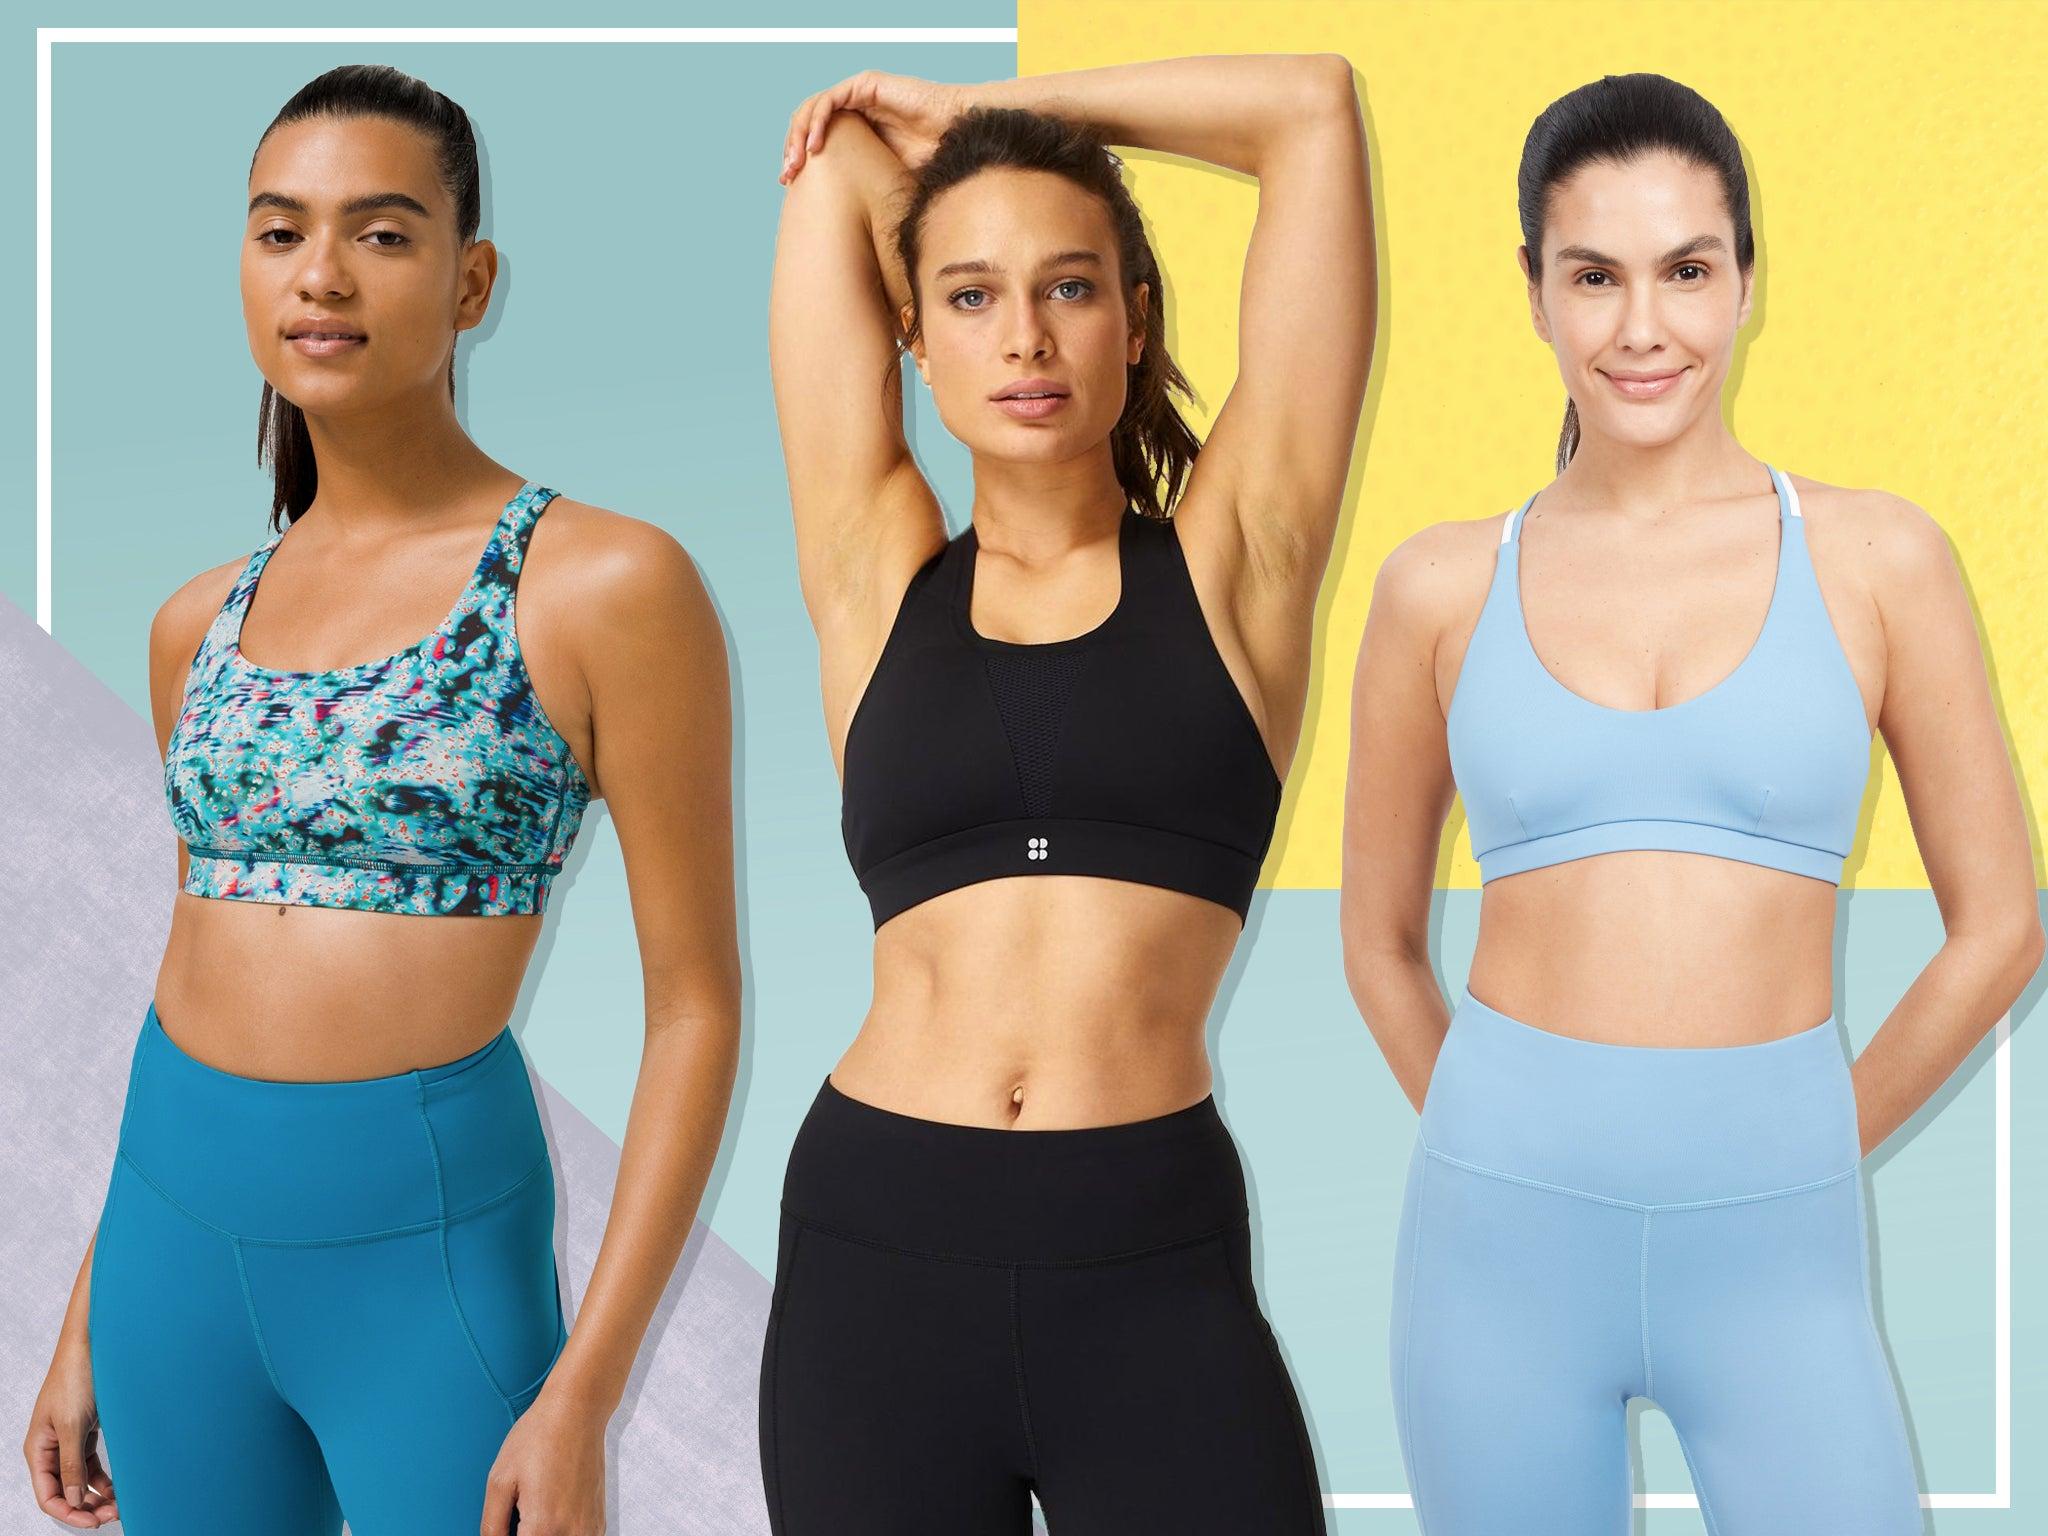 Ladies Stylish Stretchy Athletic Yoga Crop Top Tee Activewear Sportswear Eco Bralette Work out Bra Yoga Bra